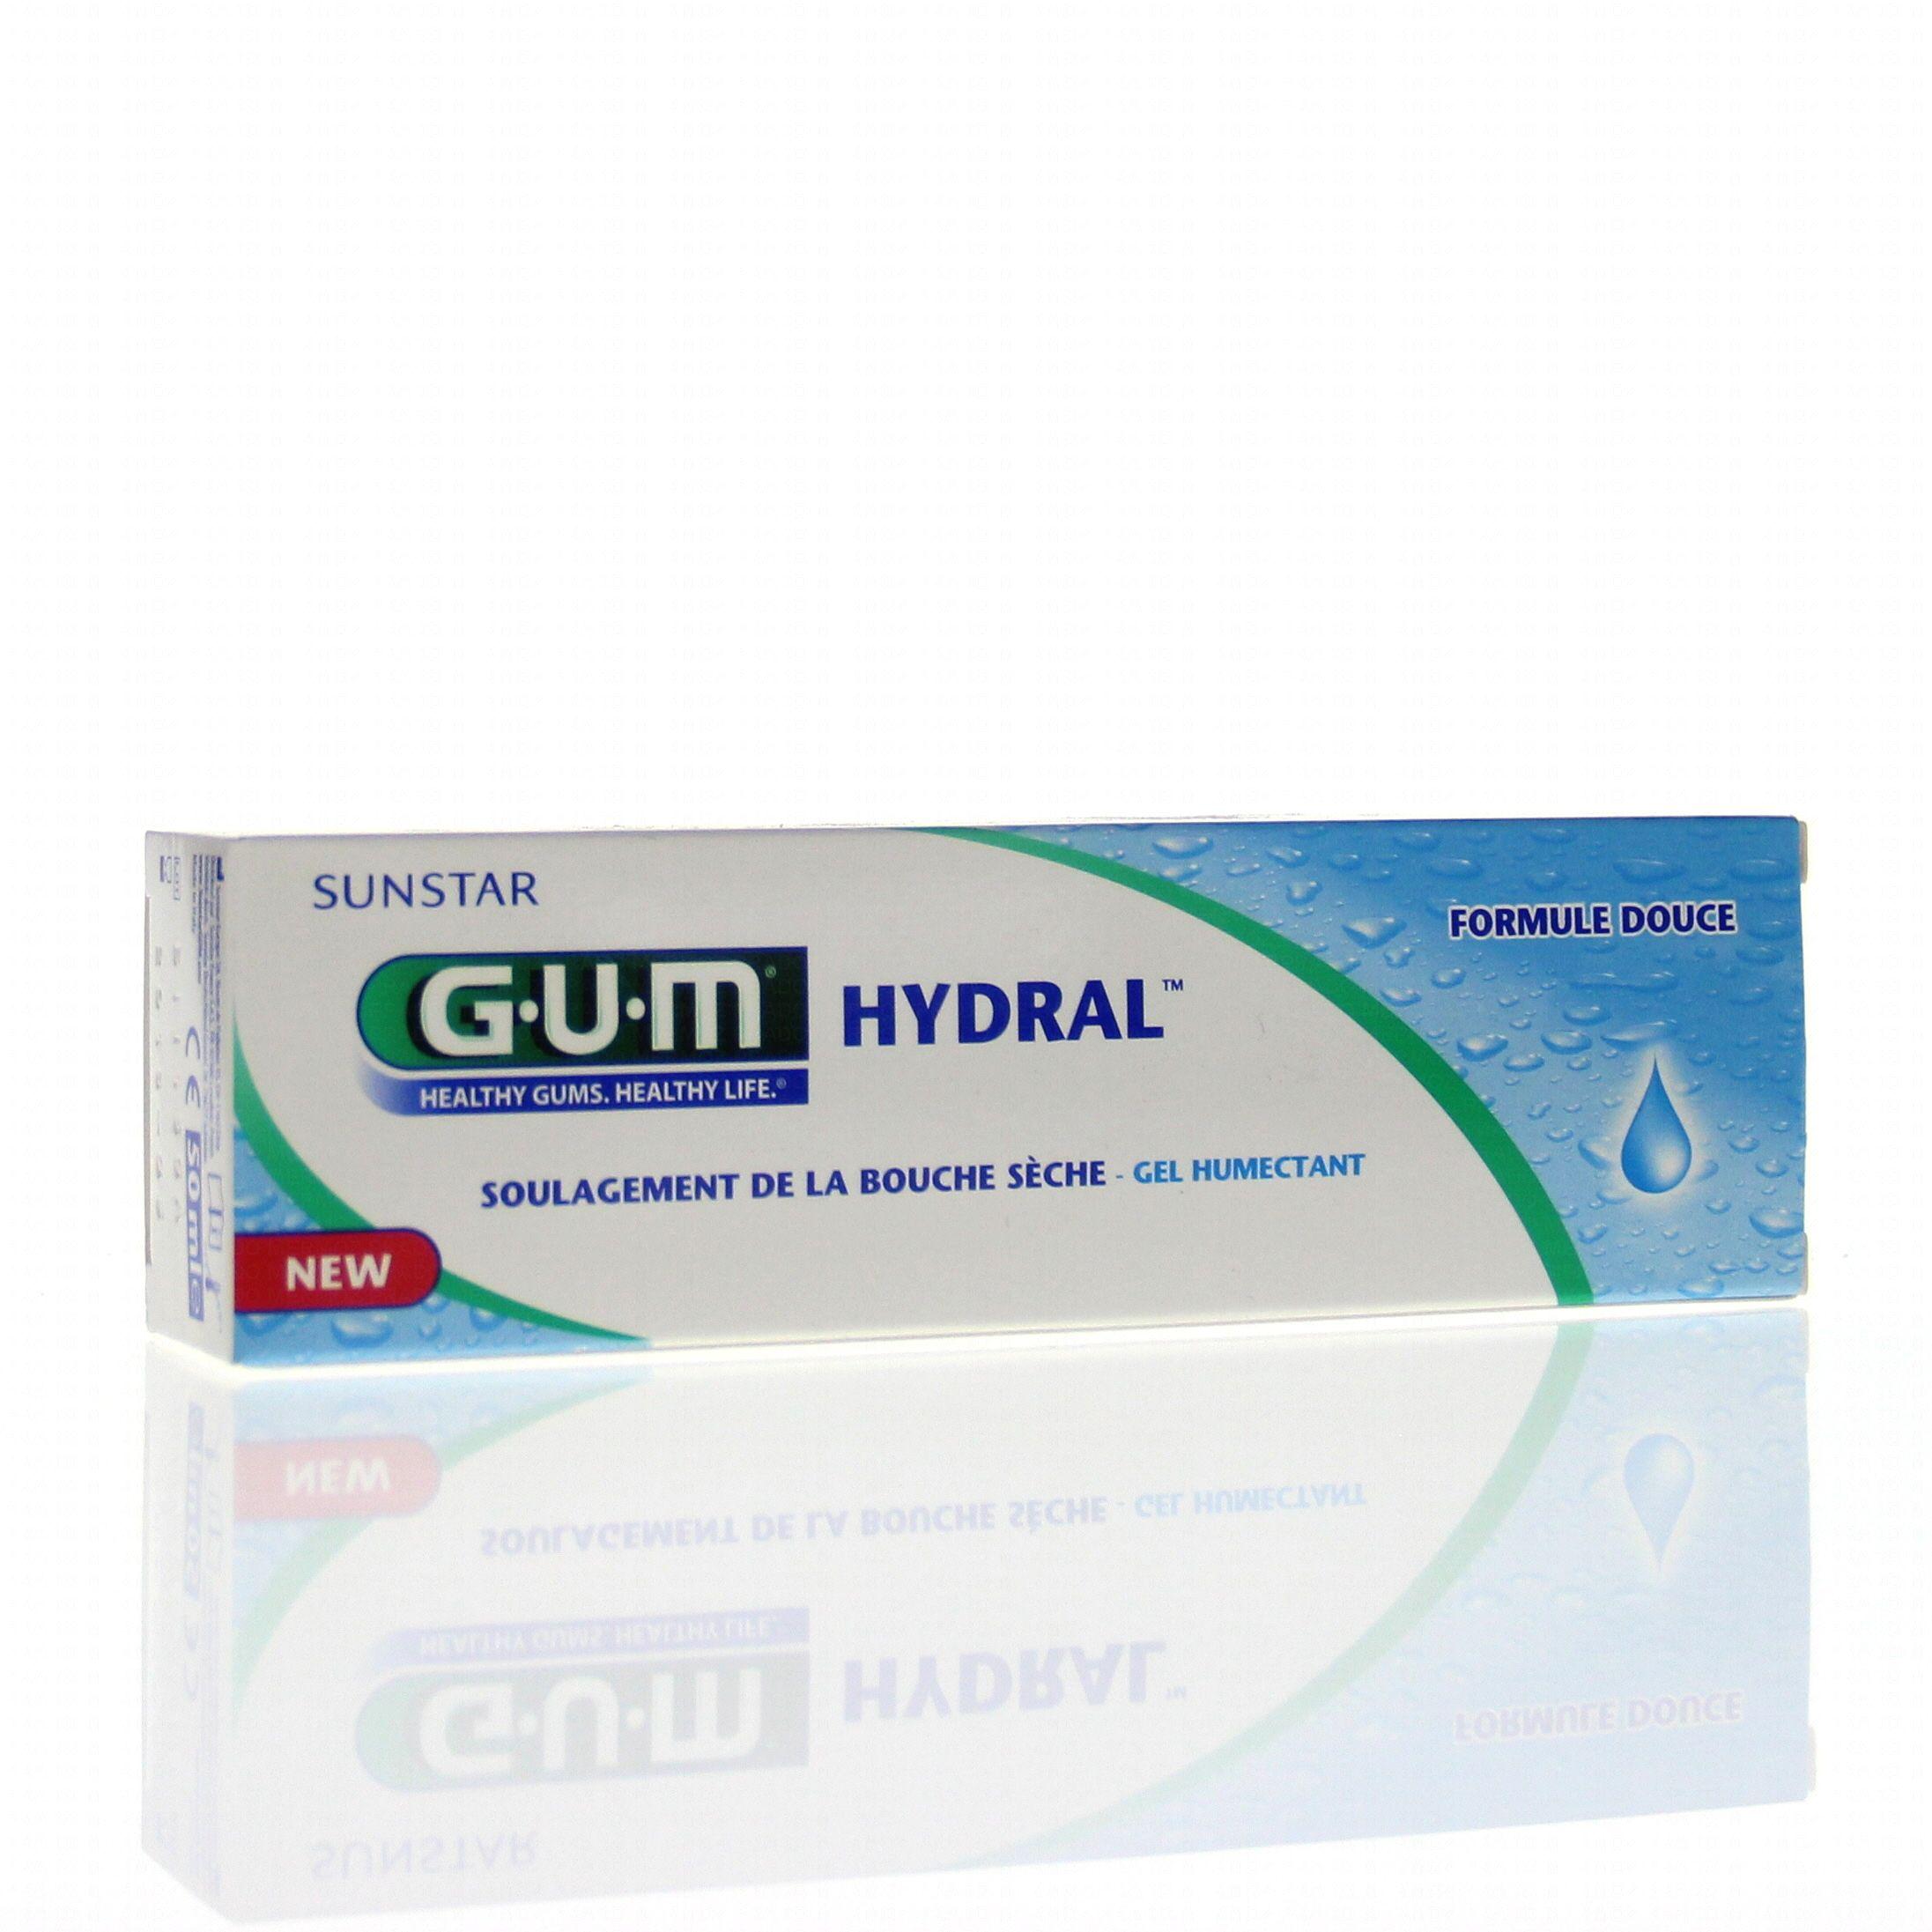 GUM HYDRAL Gel humectant bouche sèche tube 50ml